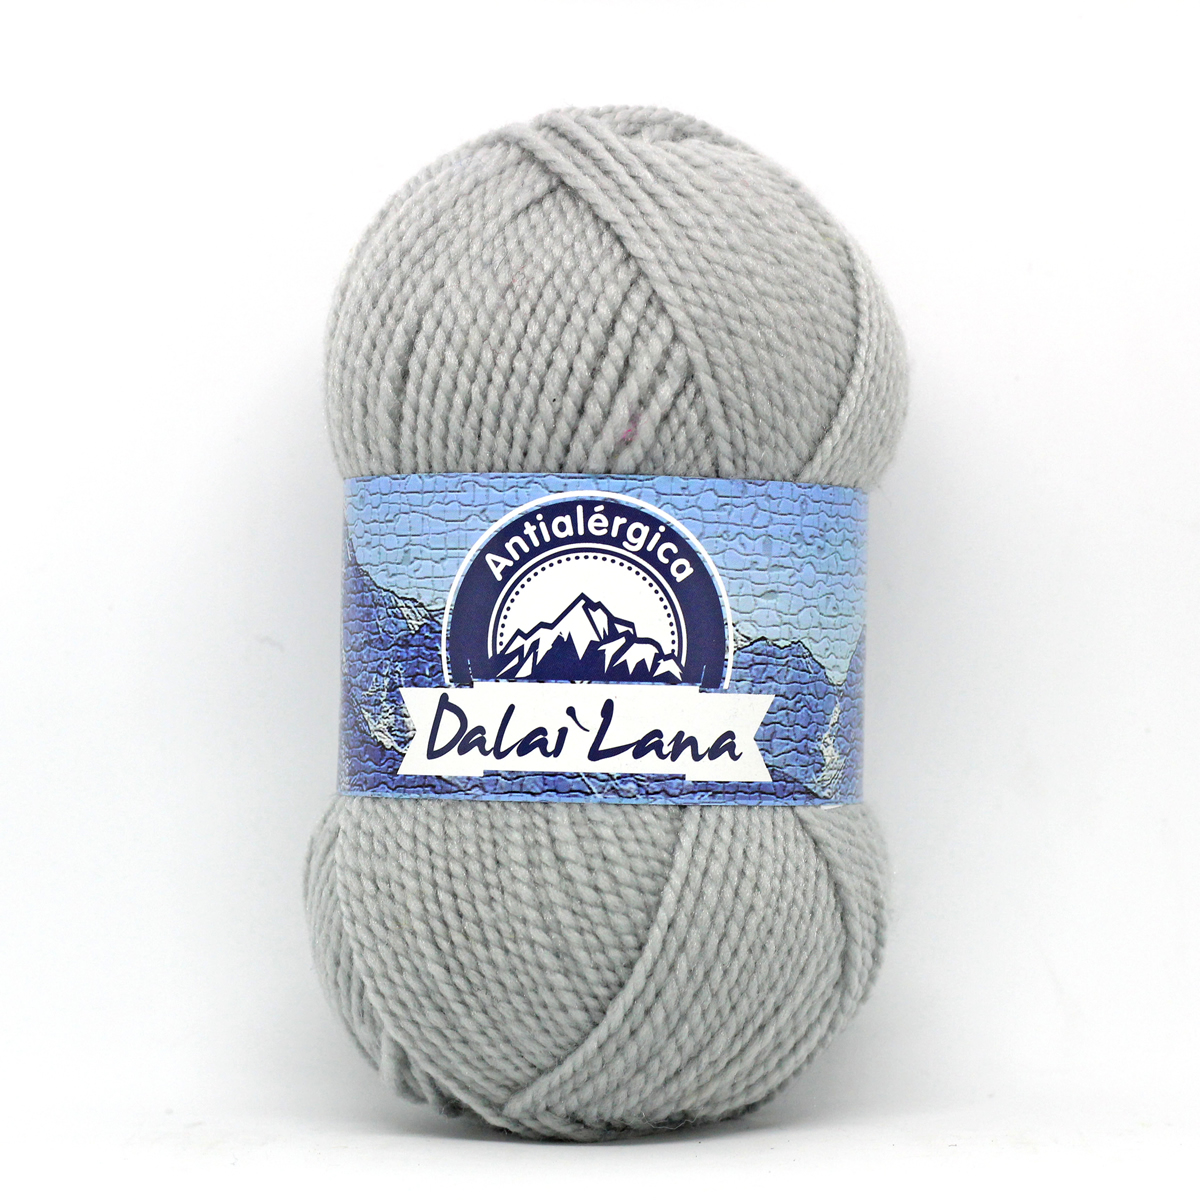 Dalai Lana - 763